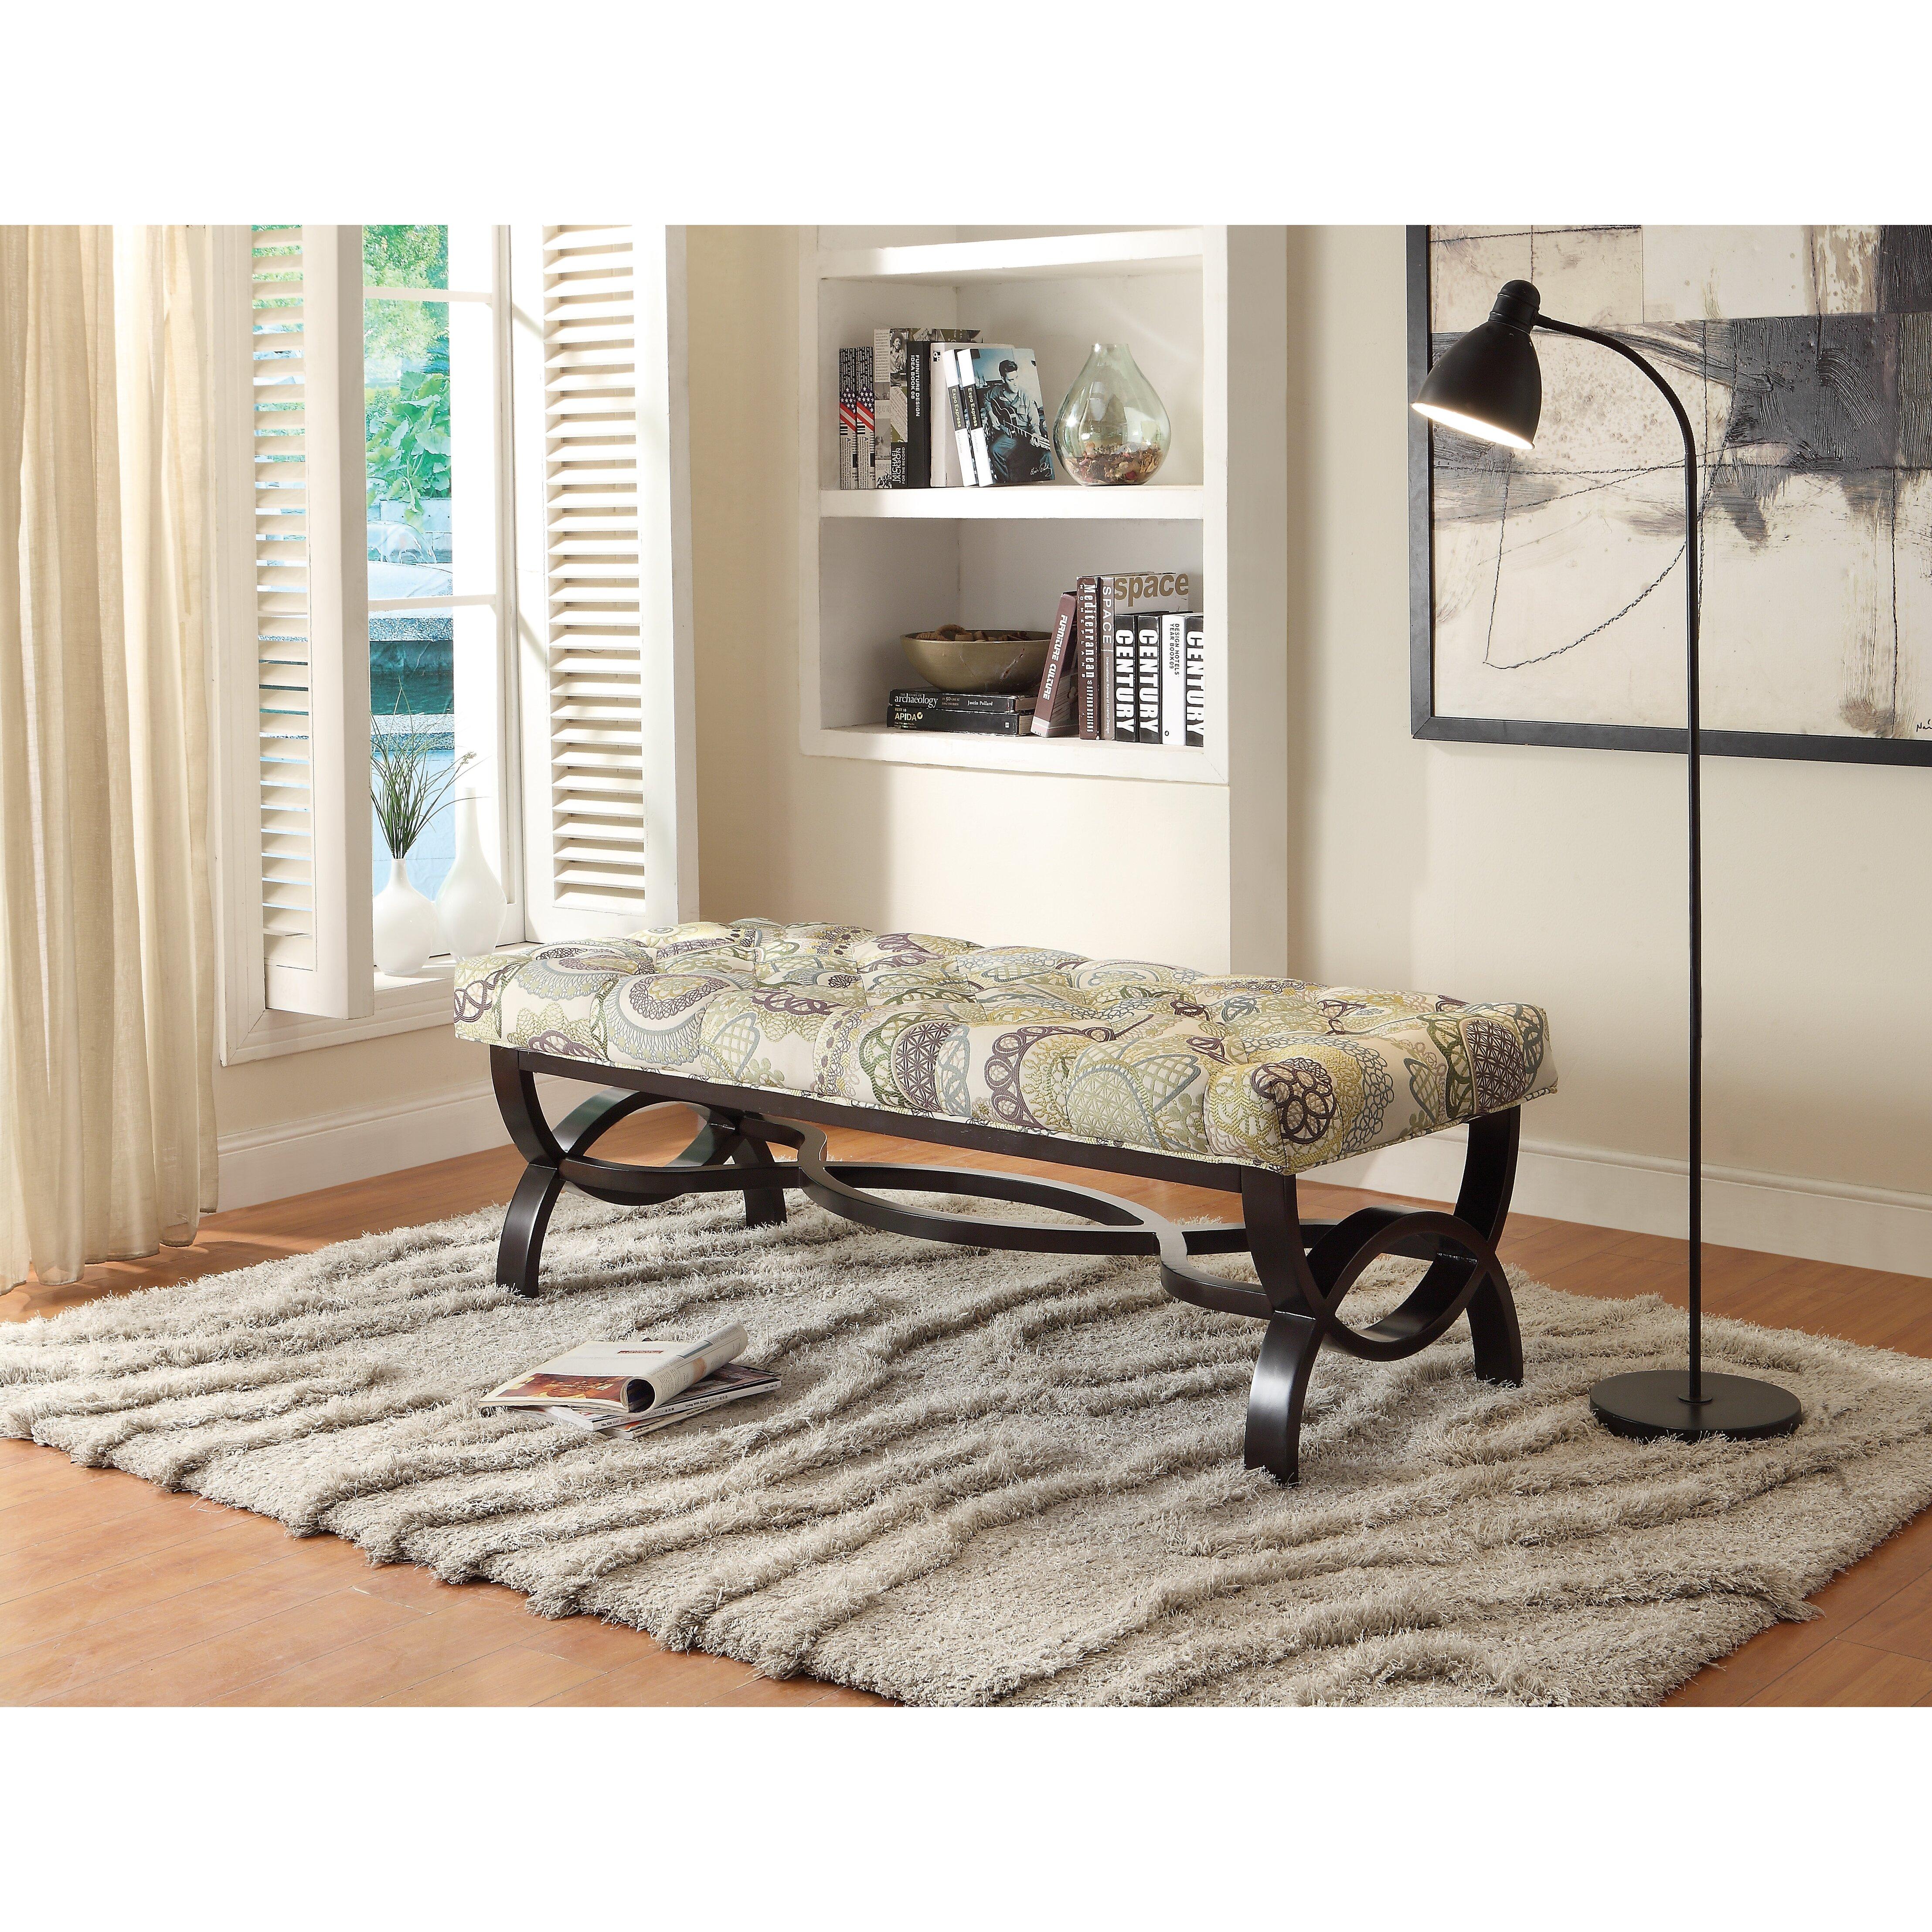 Designs Bedroom Furniture